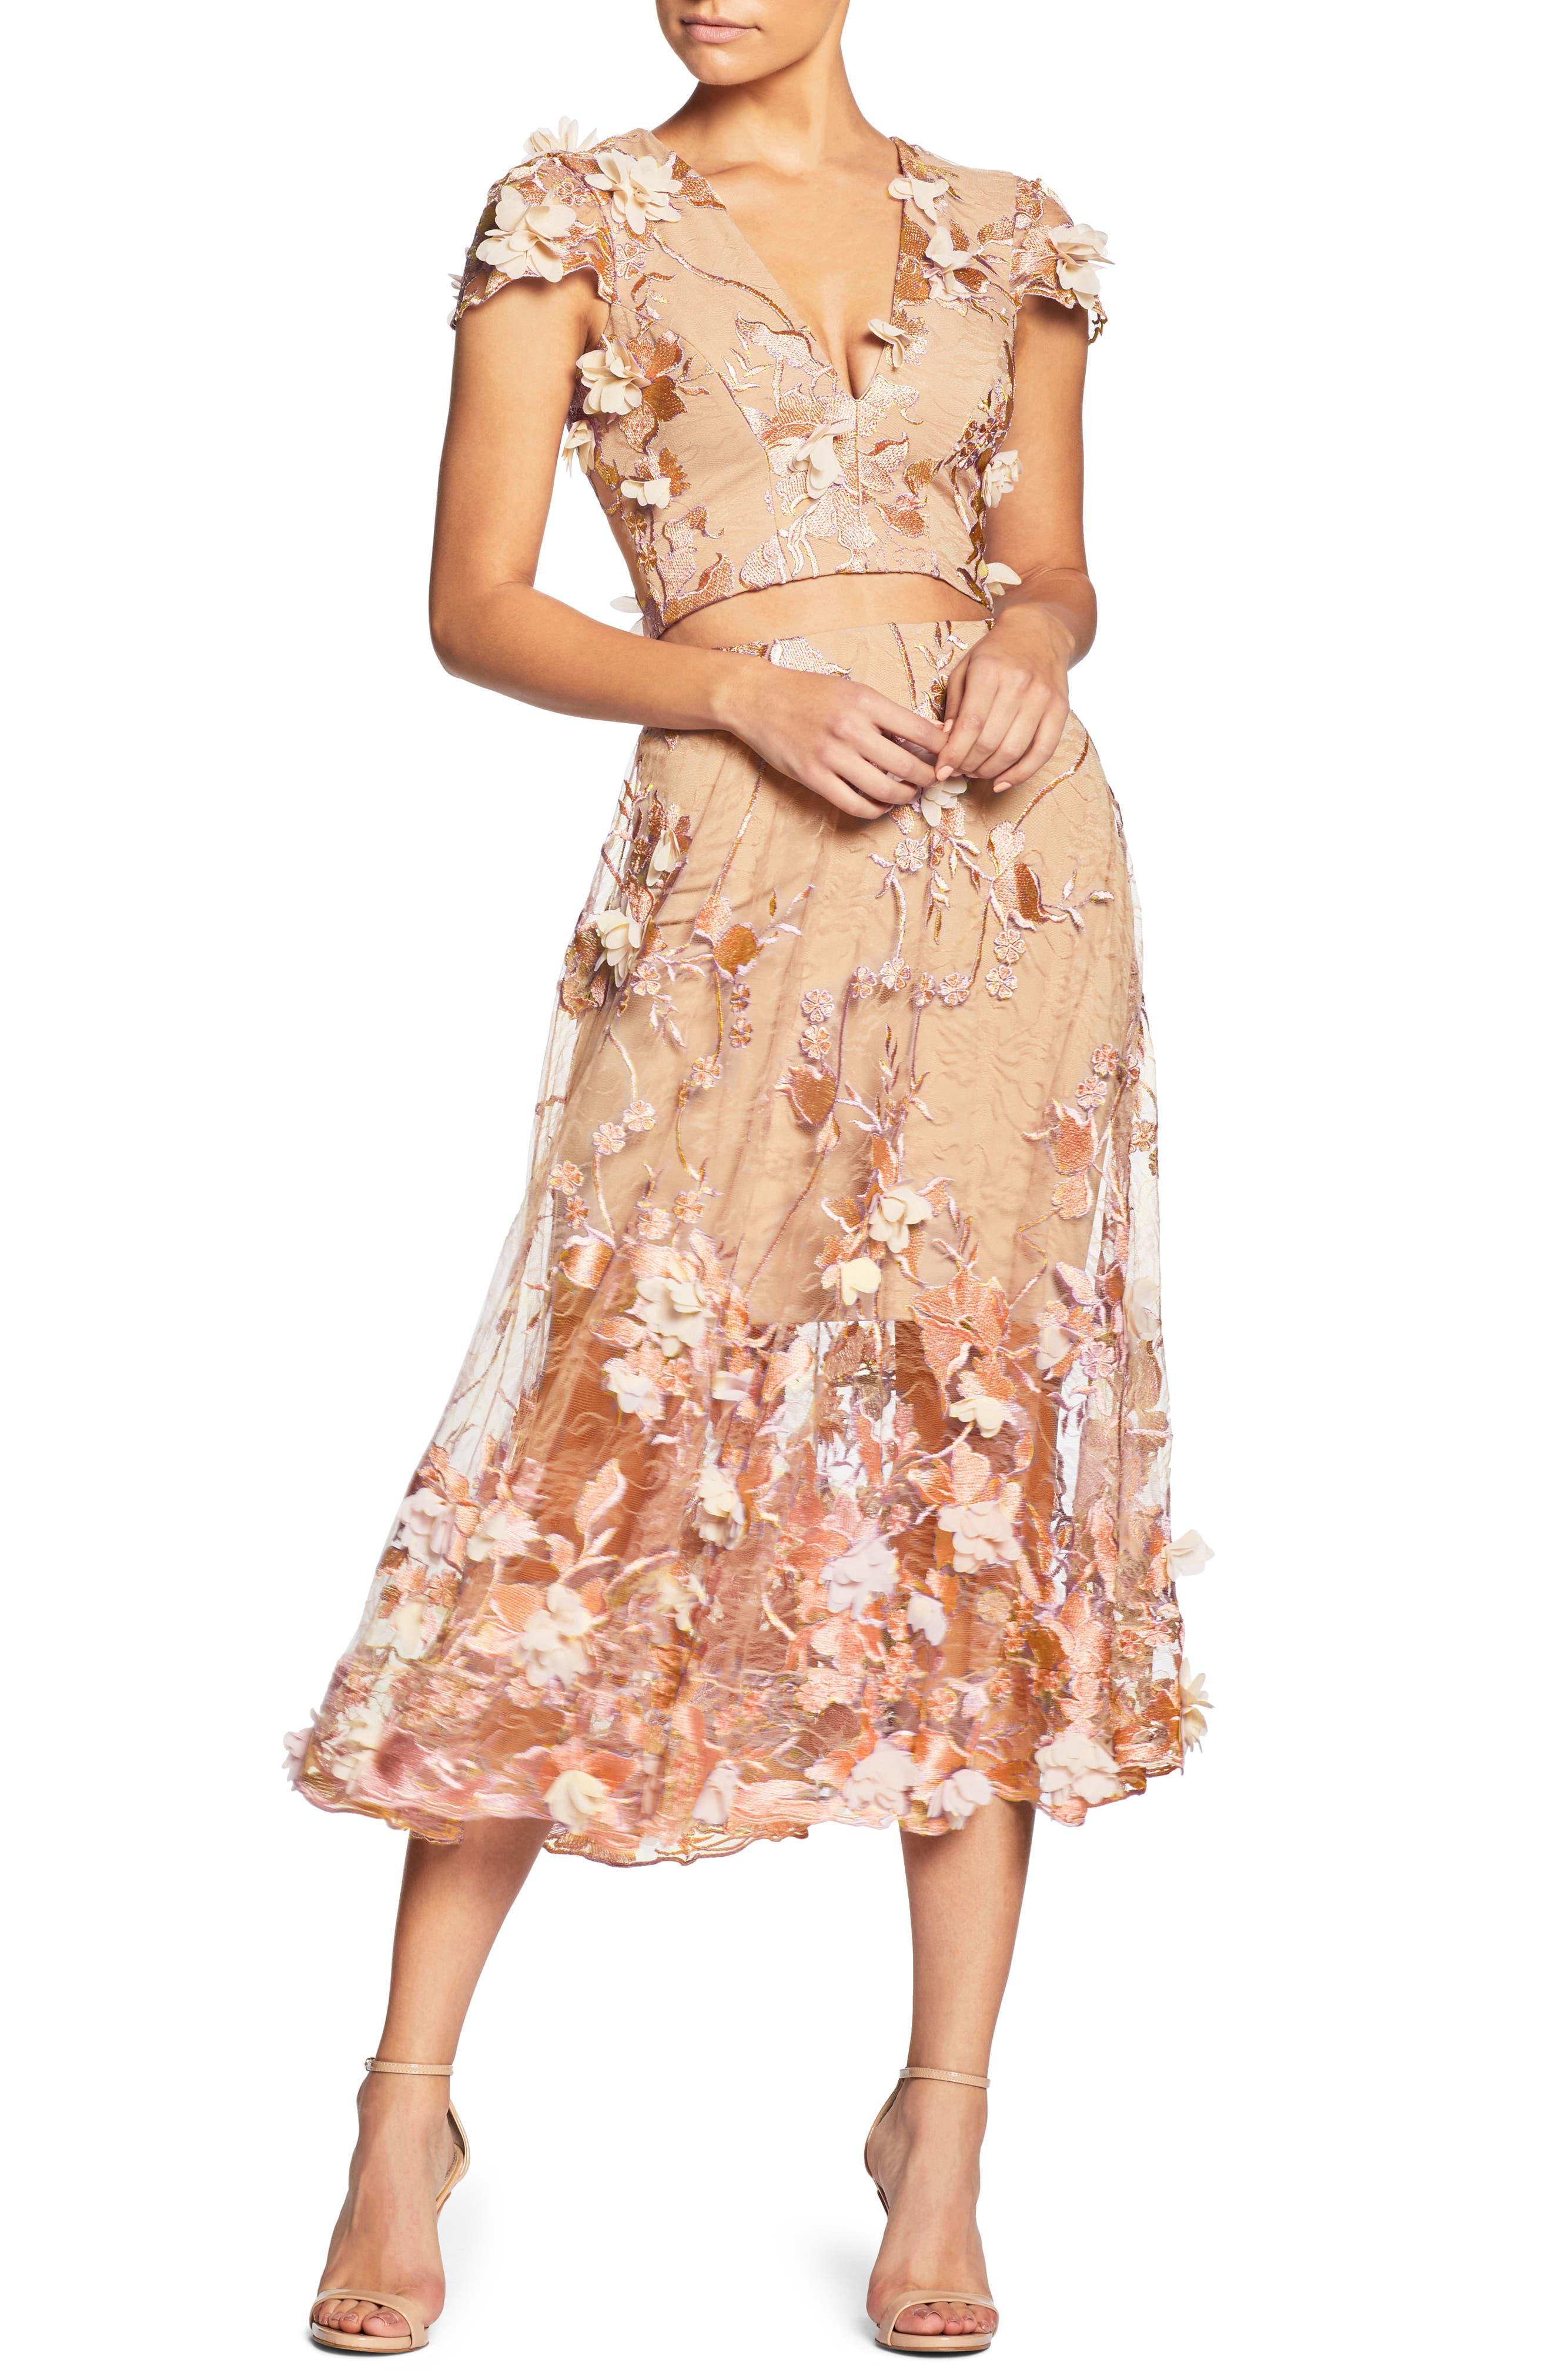 Juliana 3D Lace Two-Piece Dress,                             Main thumbnail 1, color,                             Peach